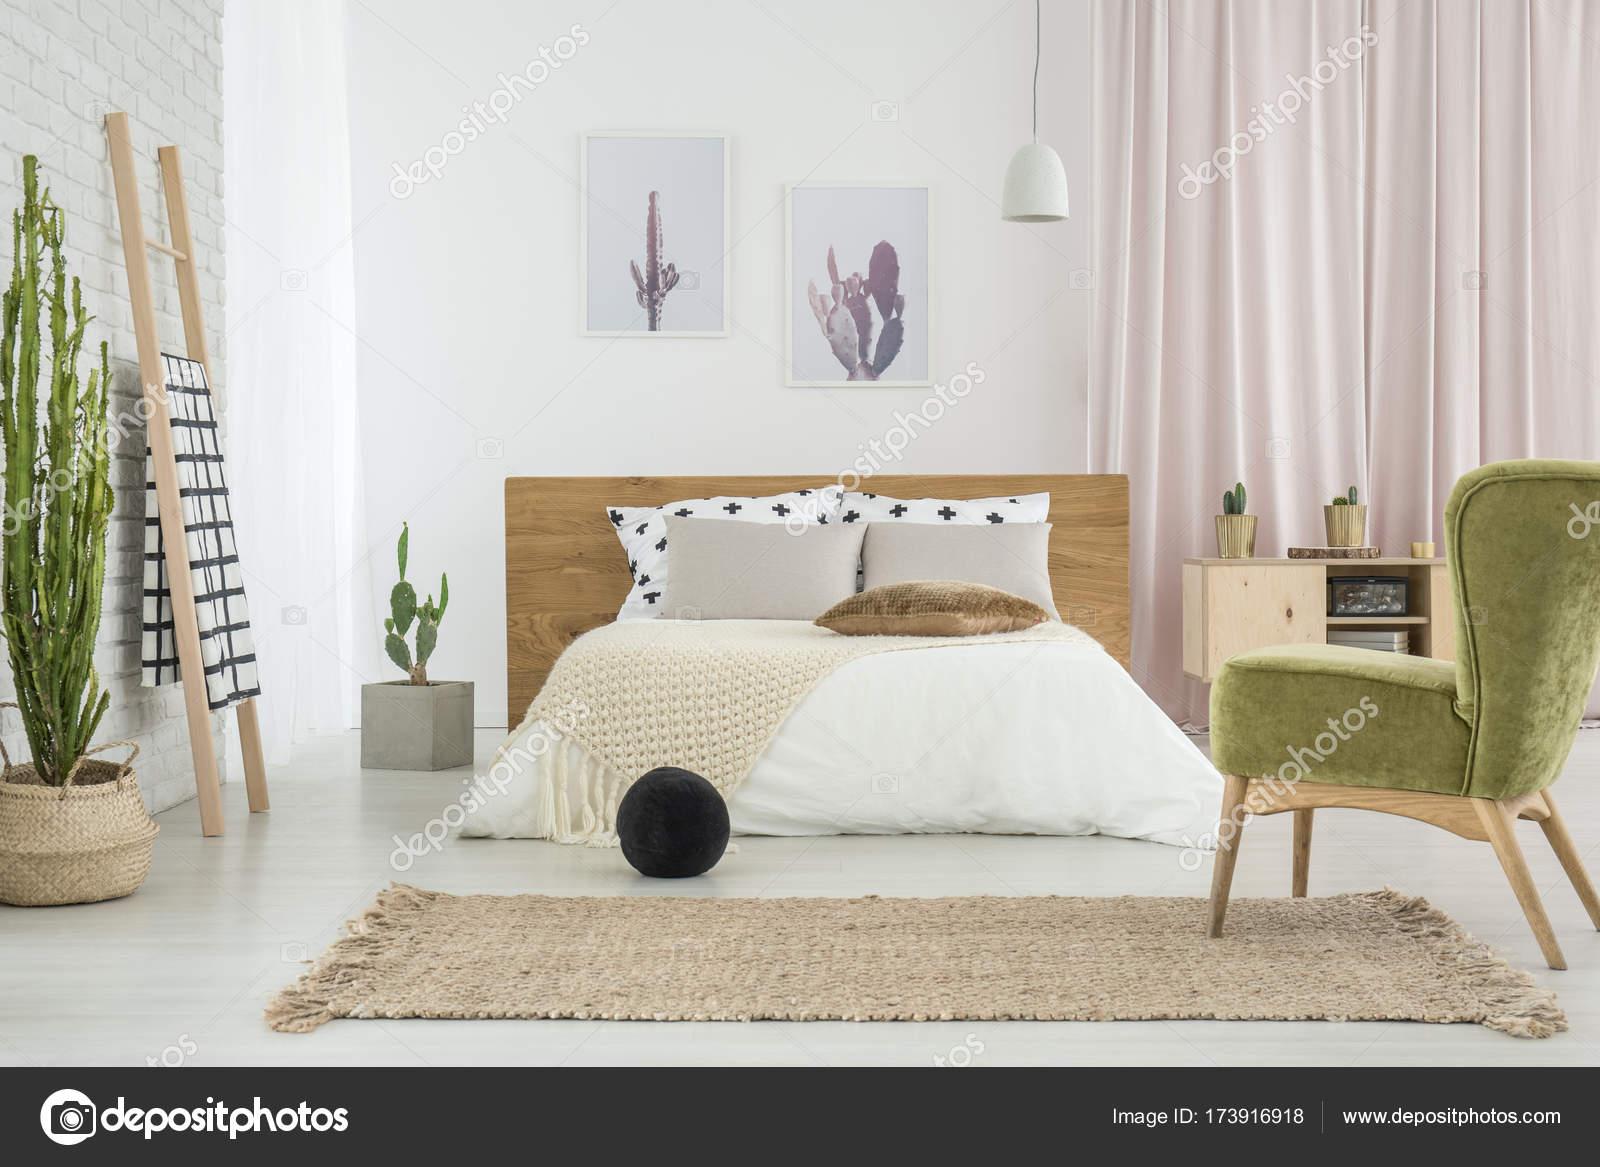 Grünen Retro-Sessel im Schlafzimmer — Stockfoto © photographee.eu ...